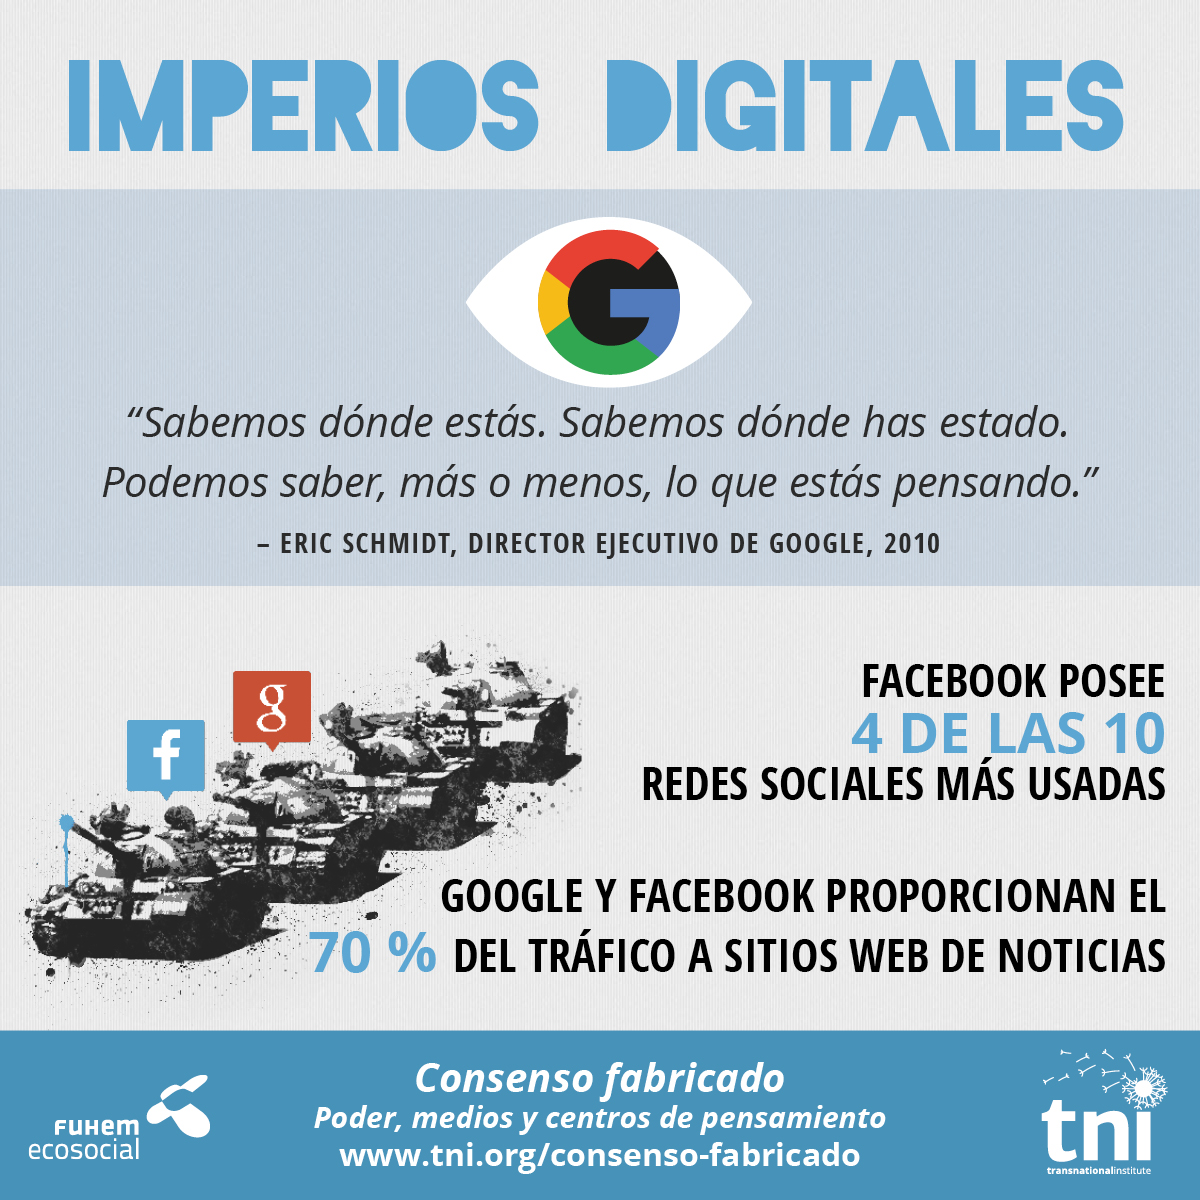 Extracto de la infografía 'Consenso fabricado' (www.tni.org/consenso-fabricado)